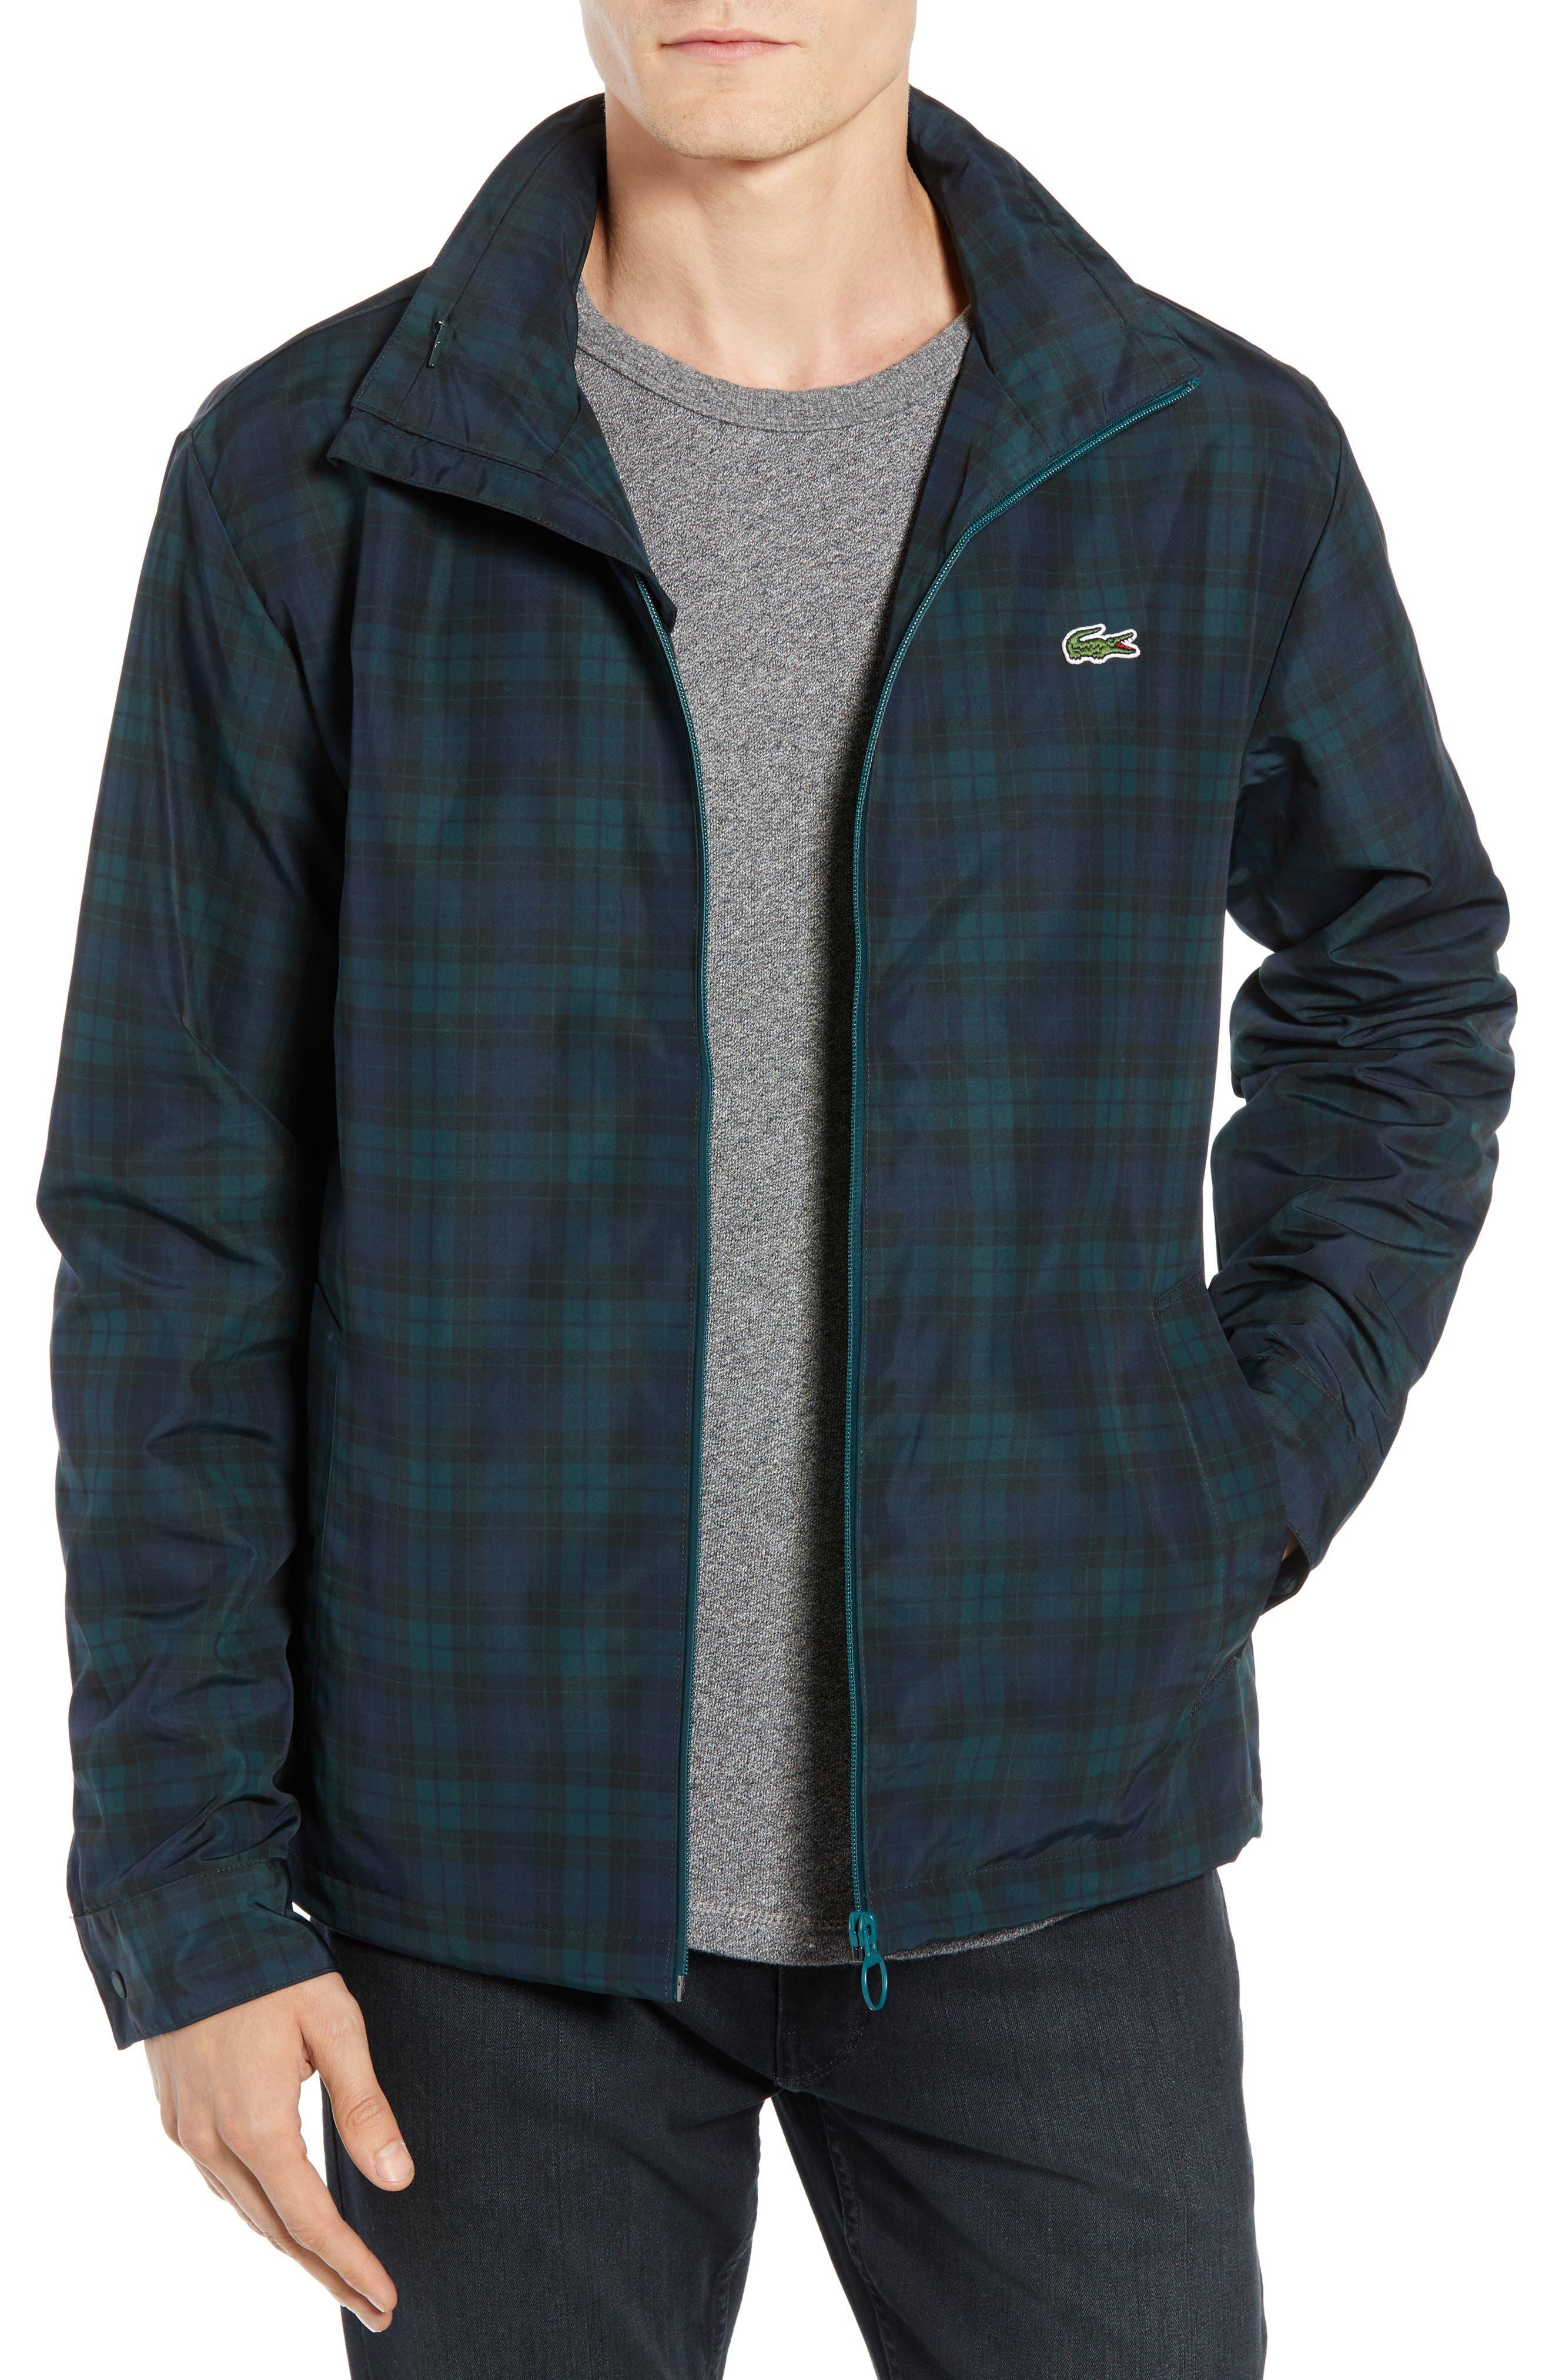 Regular Fit Check Windbreaker Jacket,                         Main,                         color, NAVY BLUE/ SINOPLE BLACK